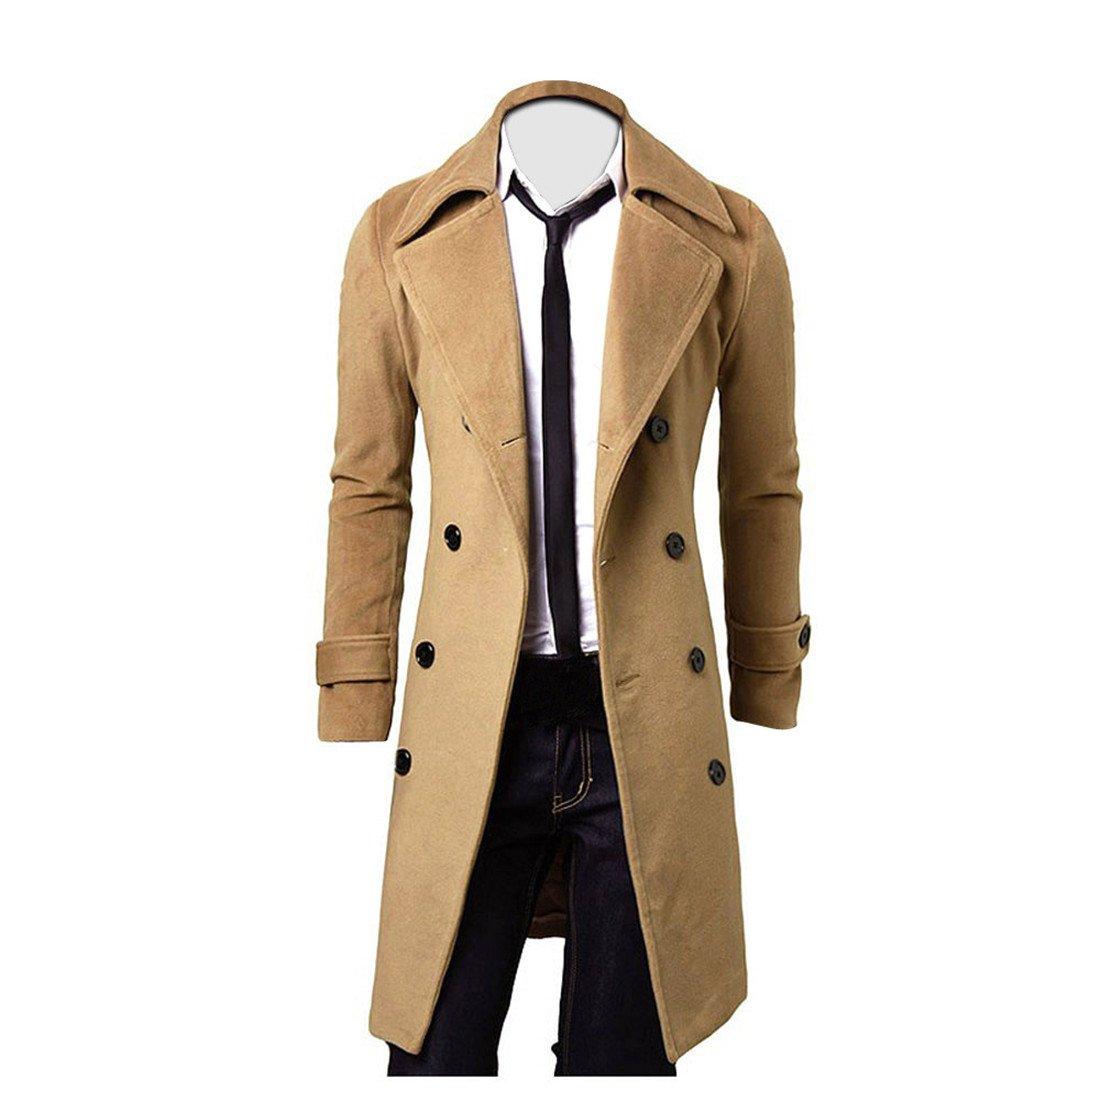 Doppelreiher Herren UFODB Peacoat Männer Trenchcoat Overcoat Elegant Knopf Outwear Lang Mantel Business übergangsjacke Winterjacke Parkajacke Oversize M-3XL